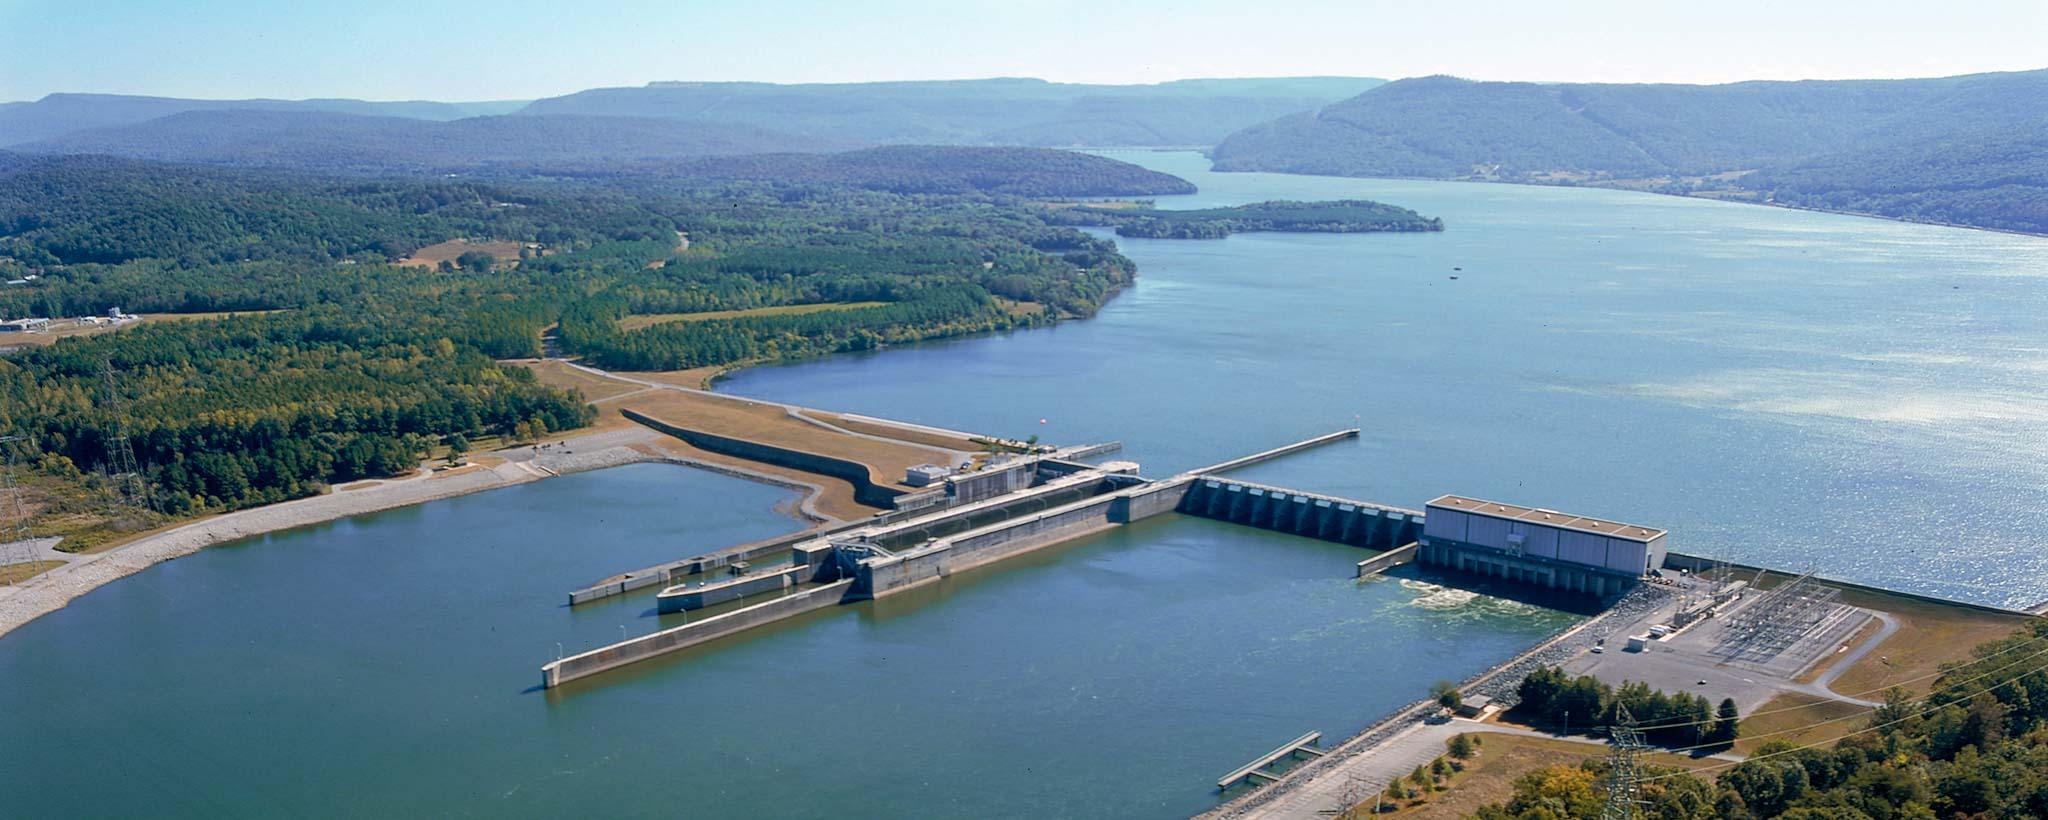 Nickajack Reservoir